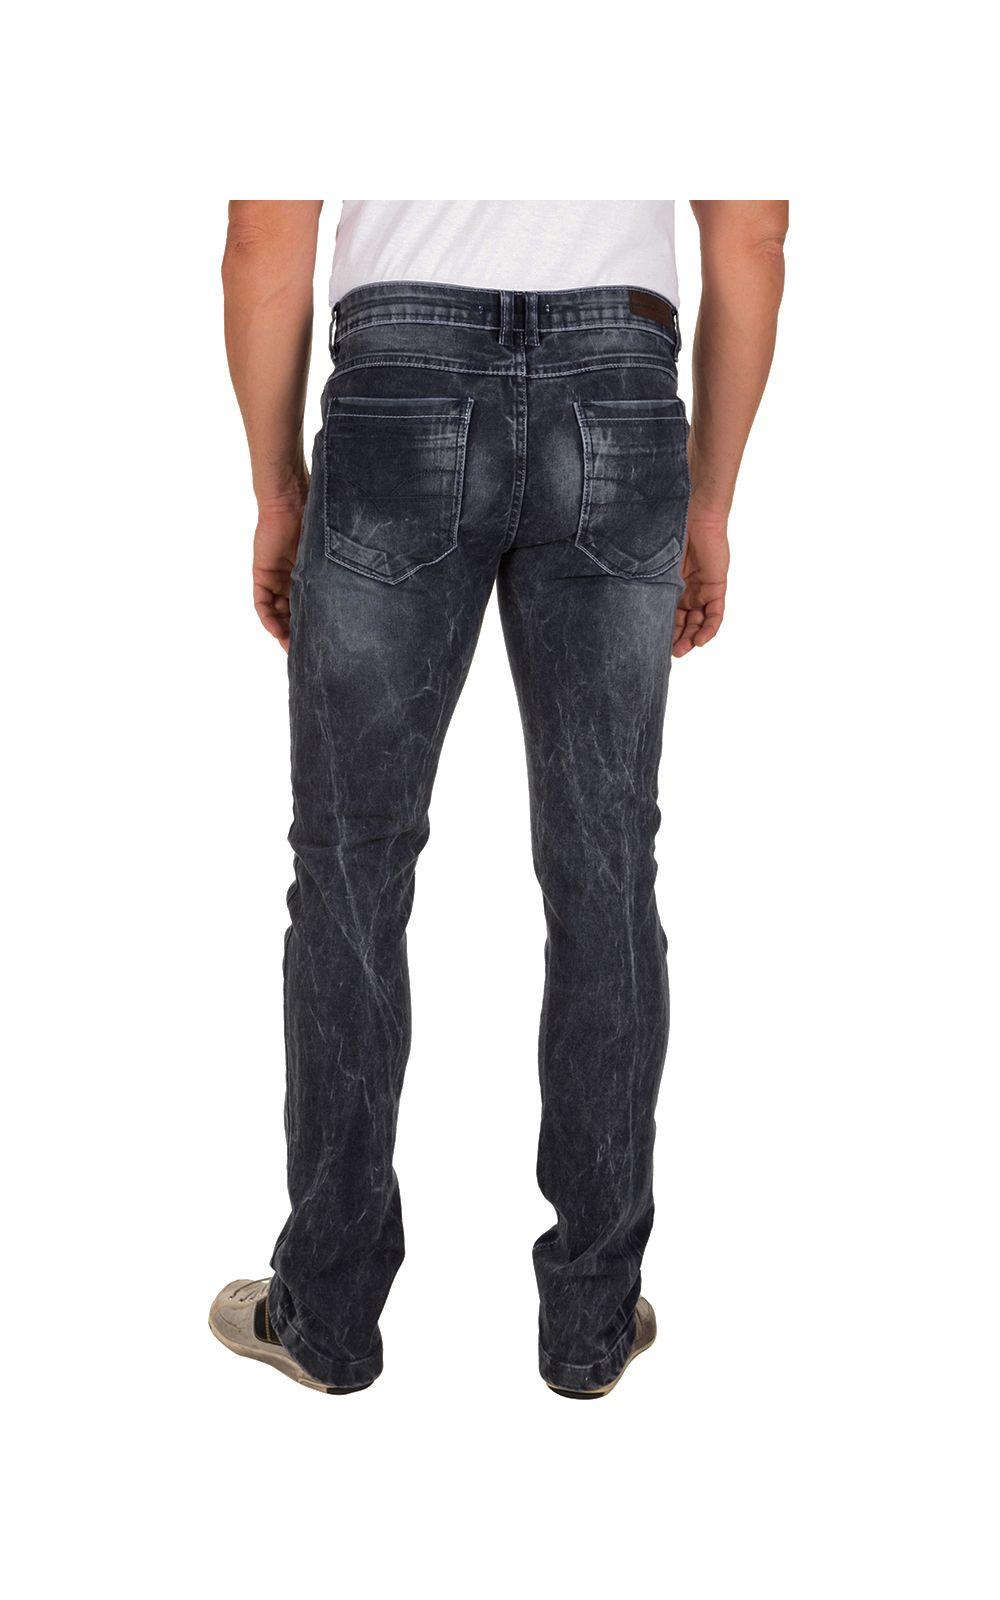 Foto 2 - Calça Jeans Masculina Preta Texturizada